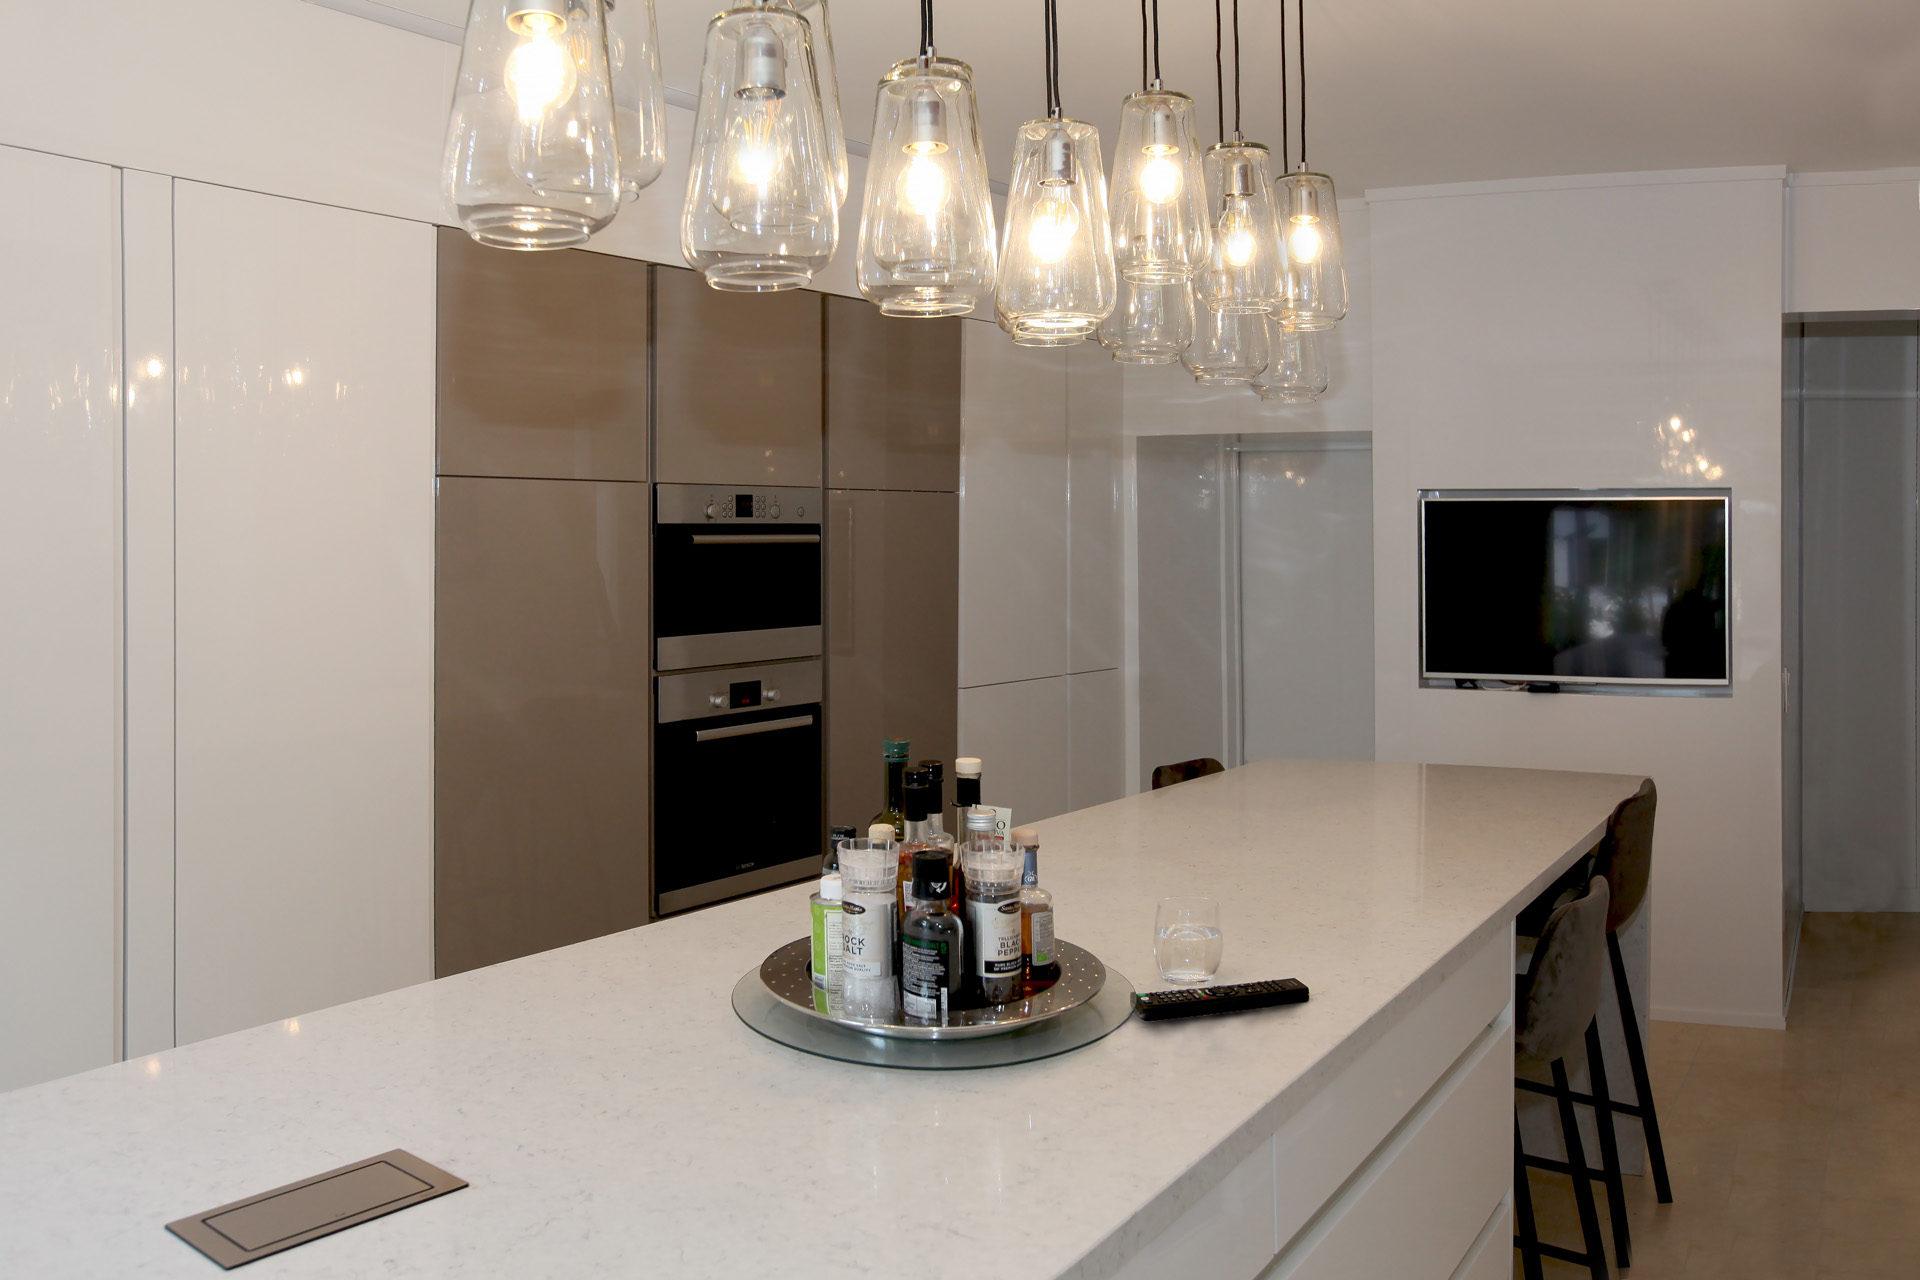 Cuisine design - Marcotte Style